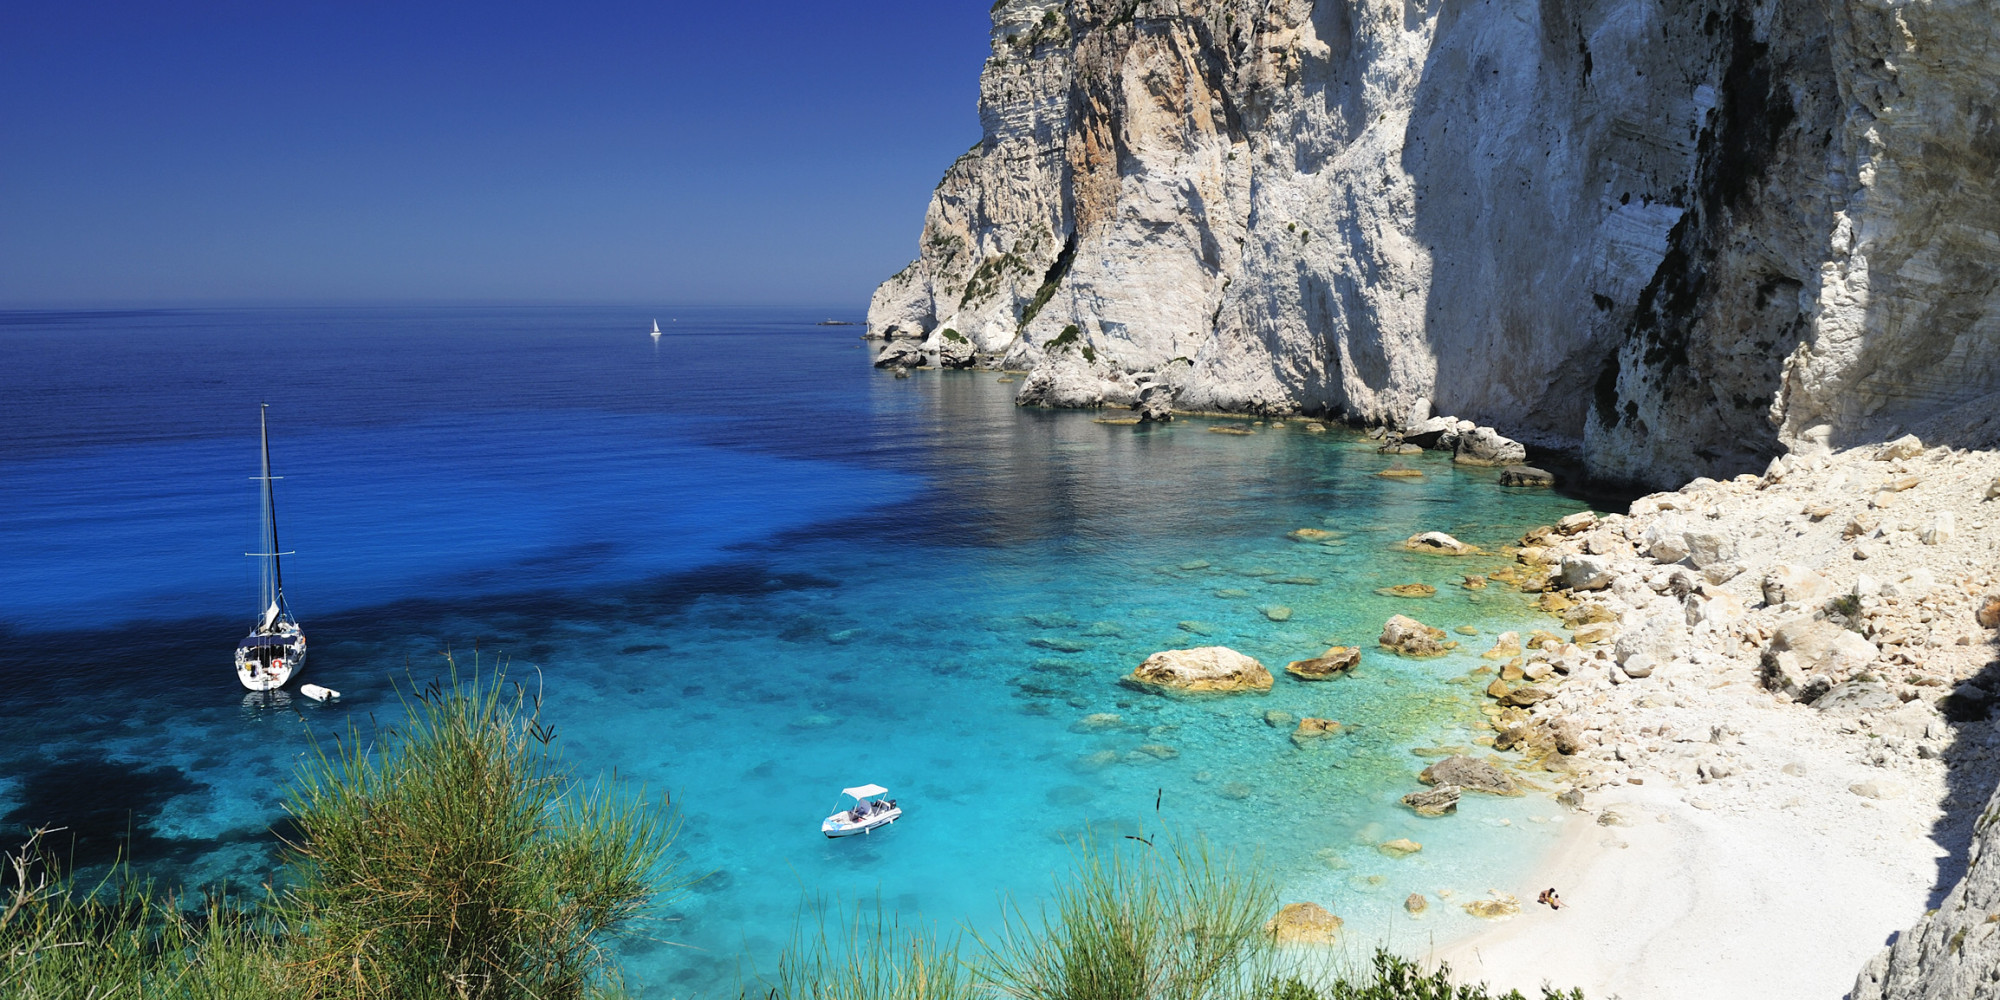 How To Get To Milos Island Greece